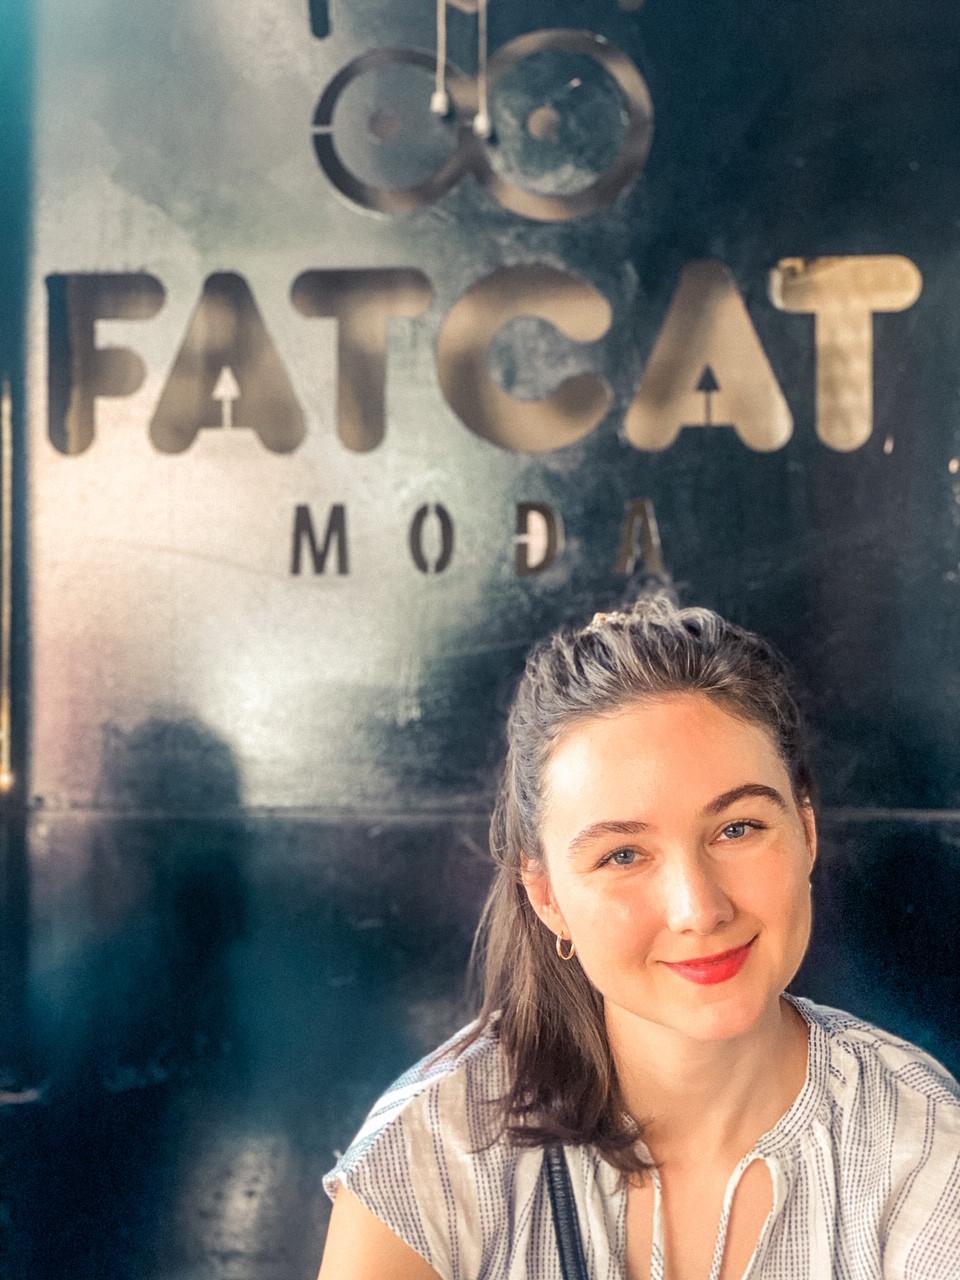 Jenna looking styling over coffee in Moda (Istanbul neighborhood)